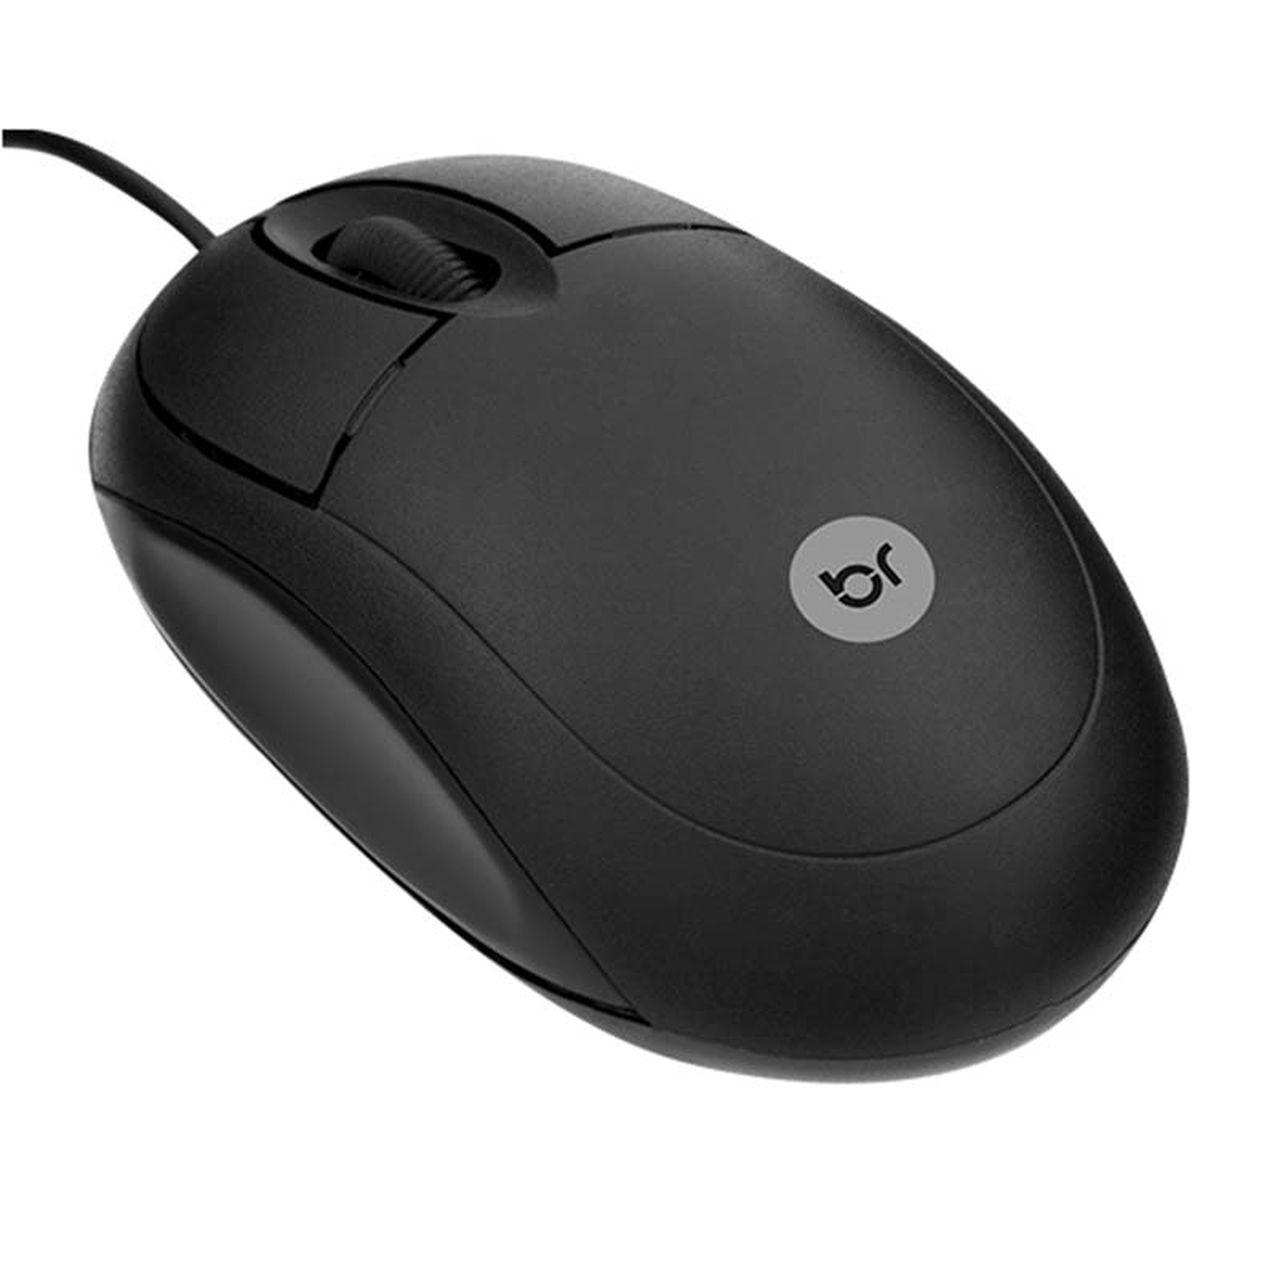 Mouse Óptico Usb Basic Preto 800 Dpi Bright 106